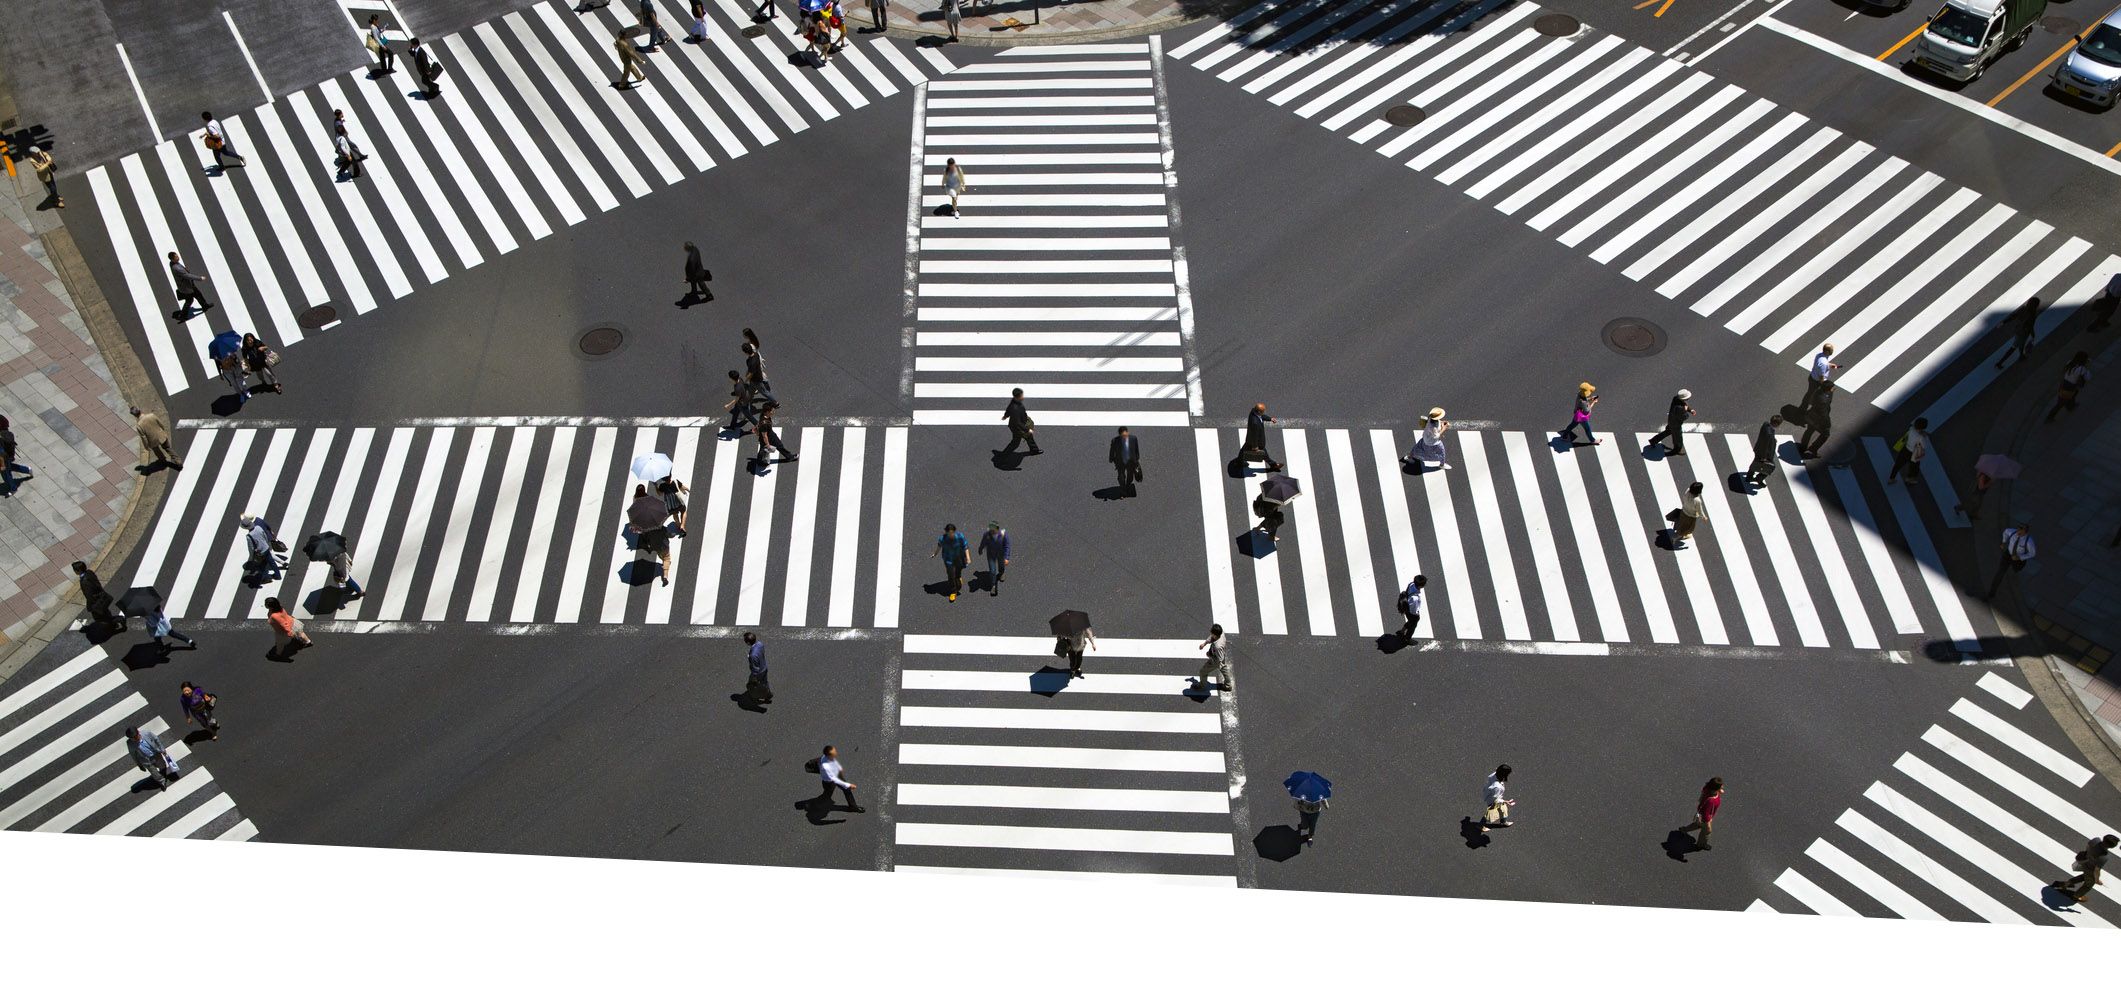 crosswalk with people walking